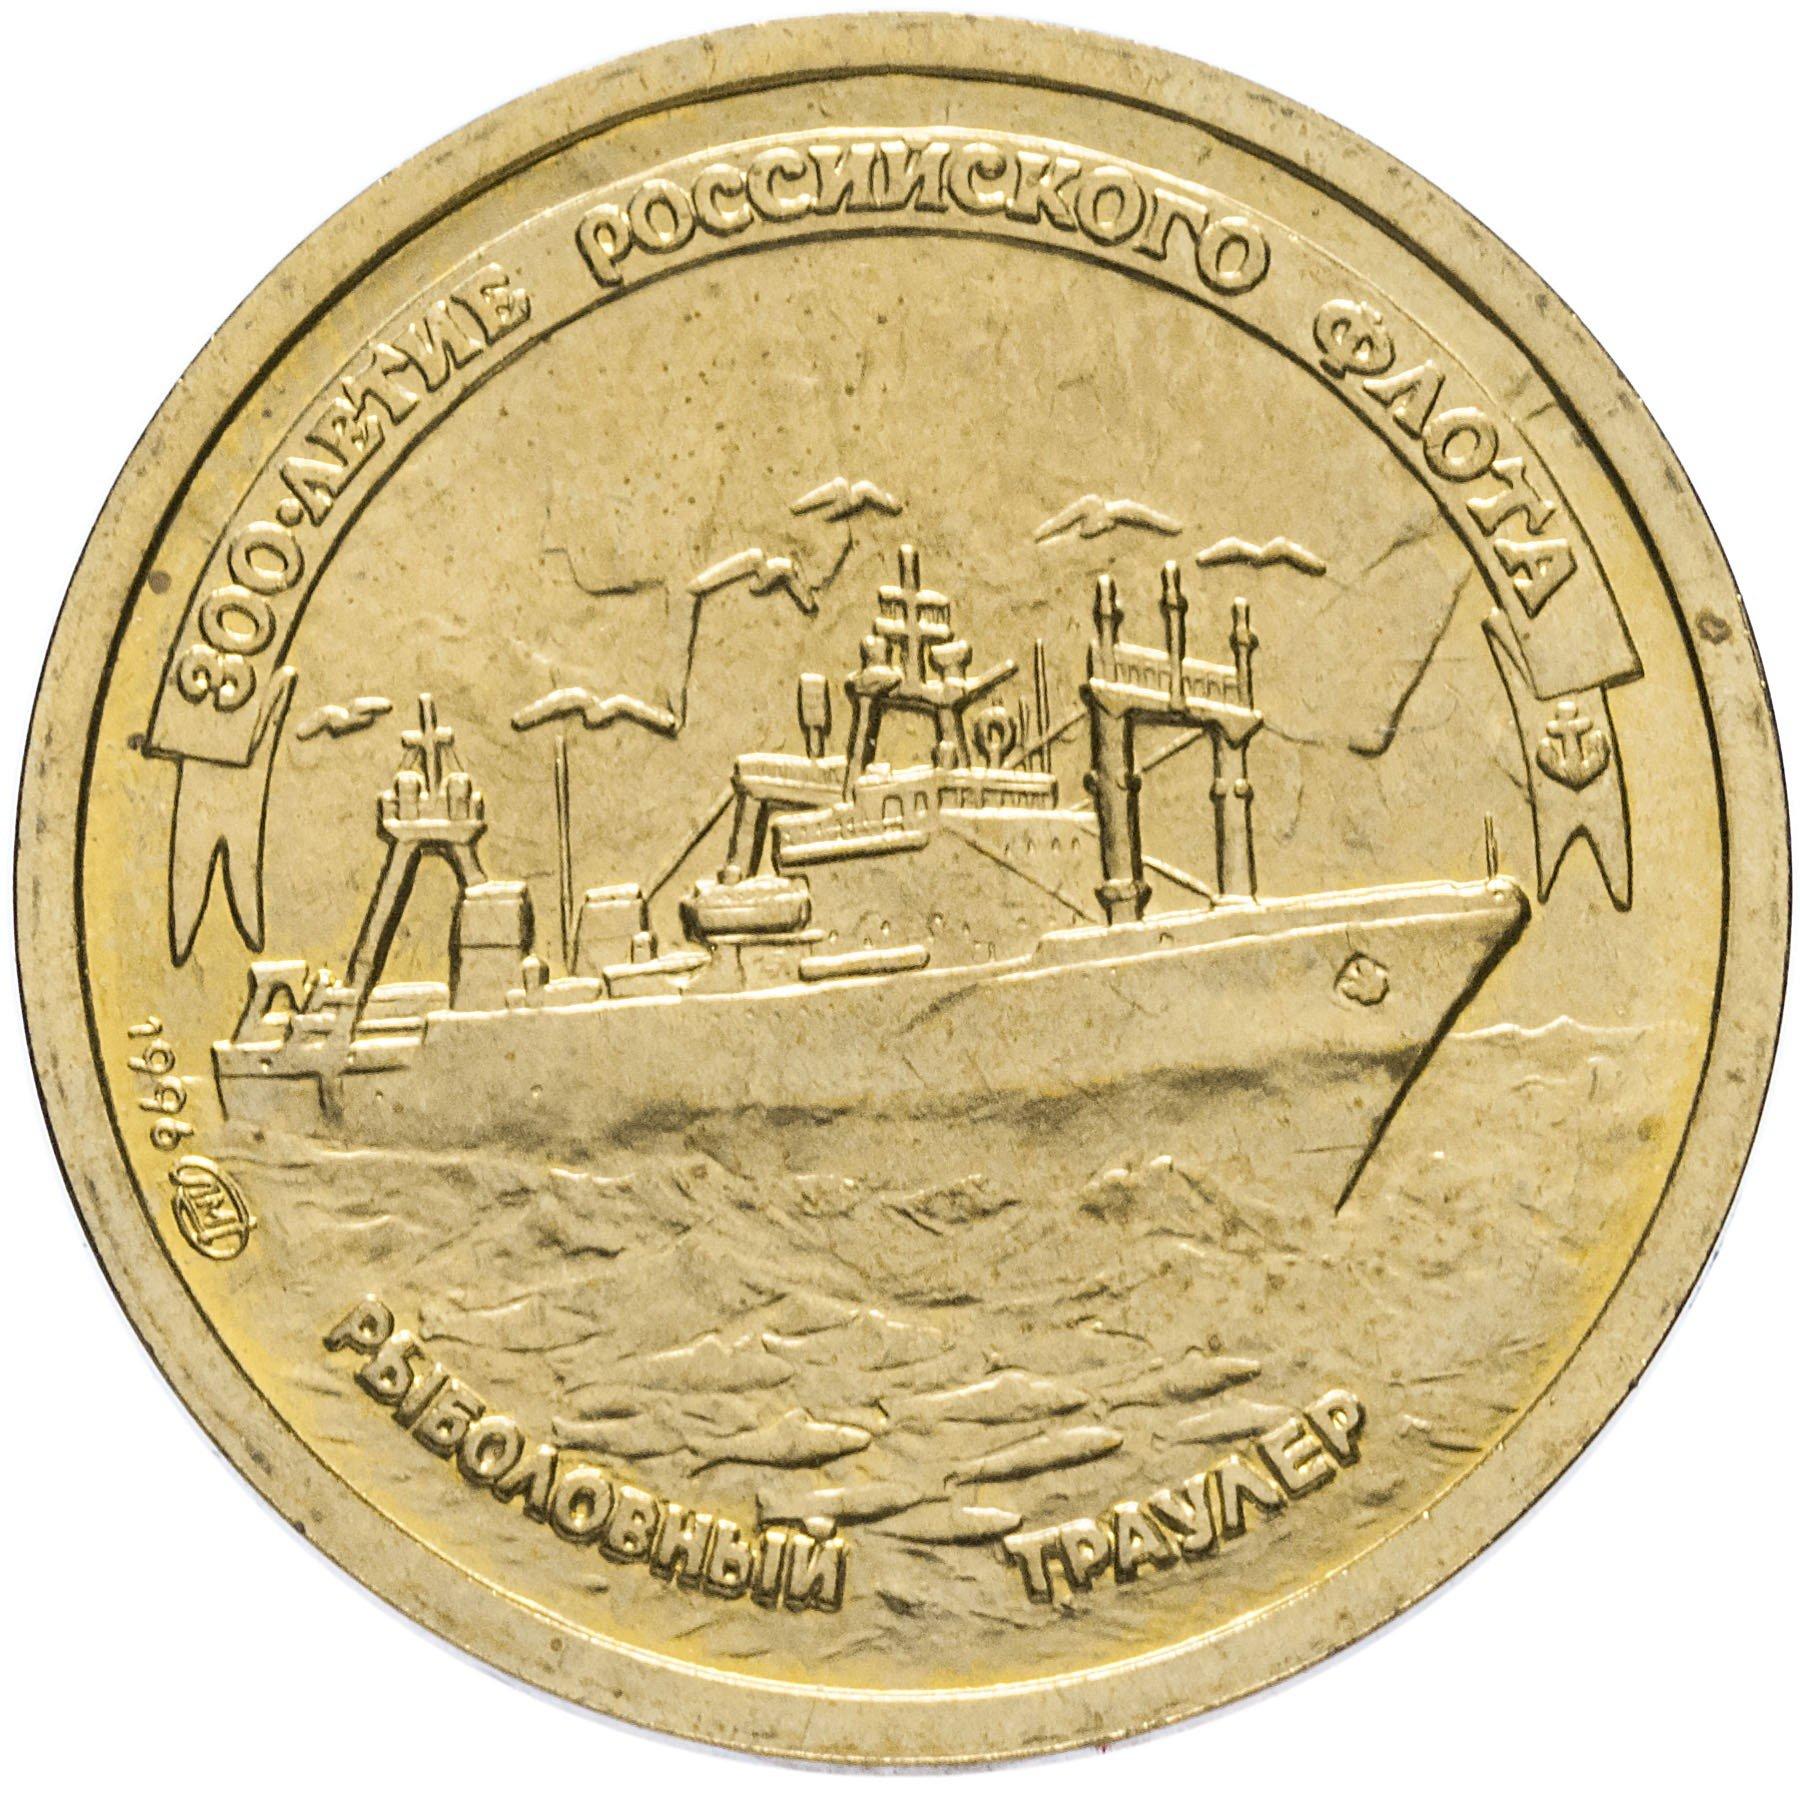 1 рубль - Рыболовный траулер